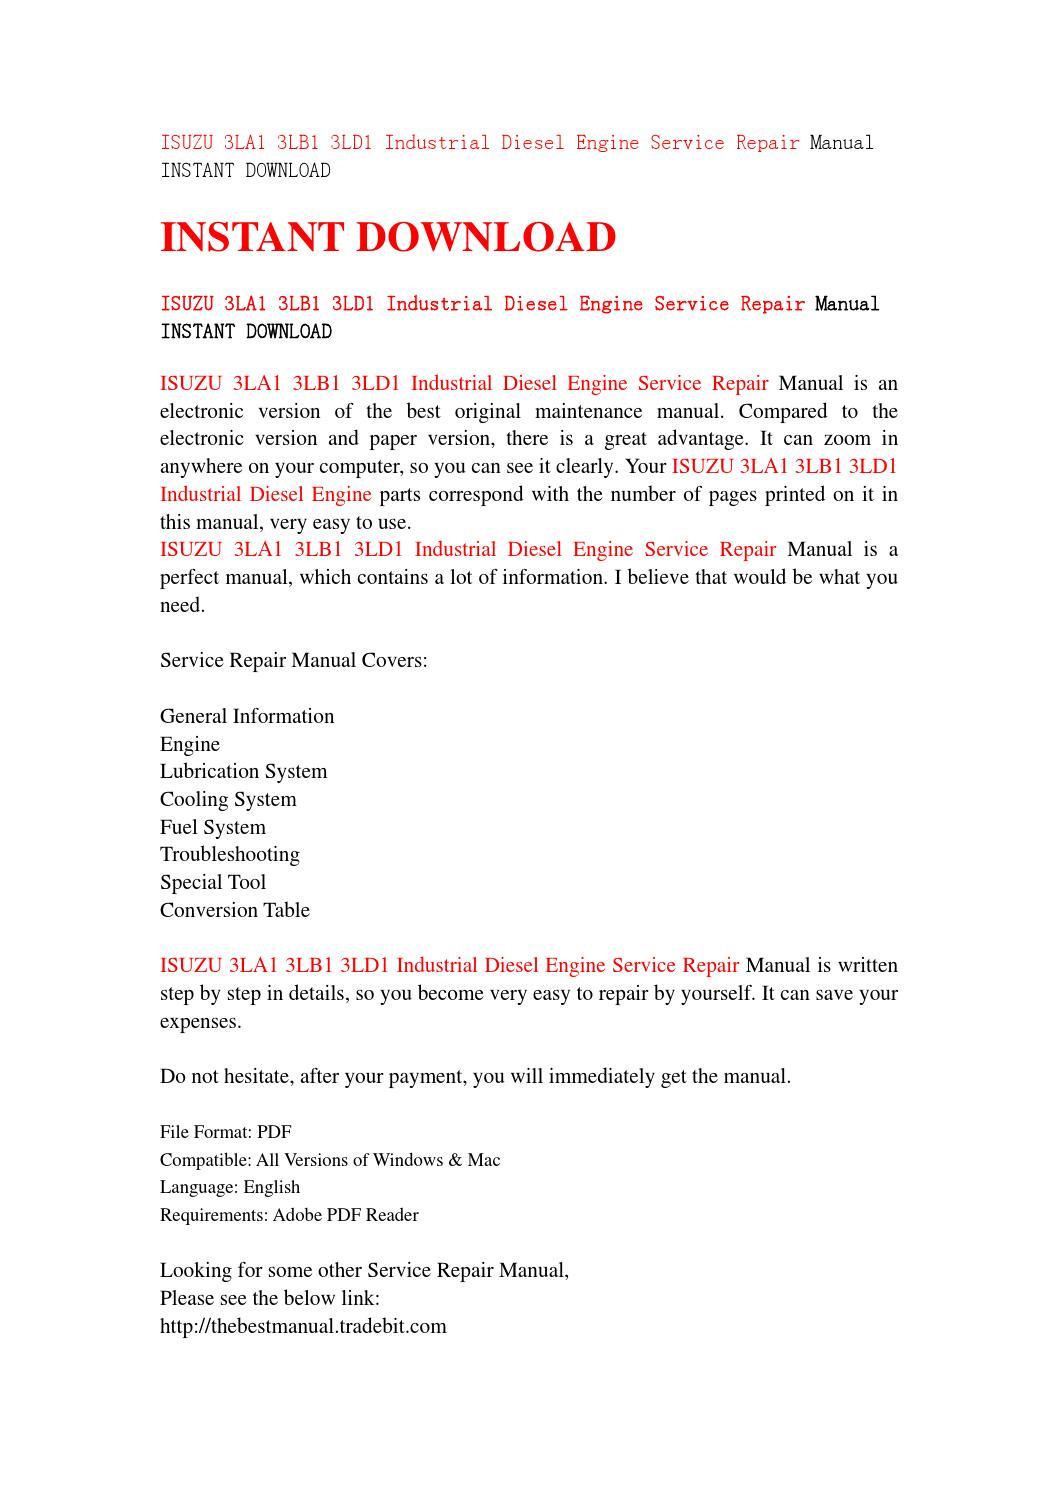 Isuzu 3la1 3lb1 3ld1 industrial diesel engine service repair manual instant  download by sfjehfsendf - issuu